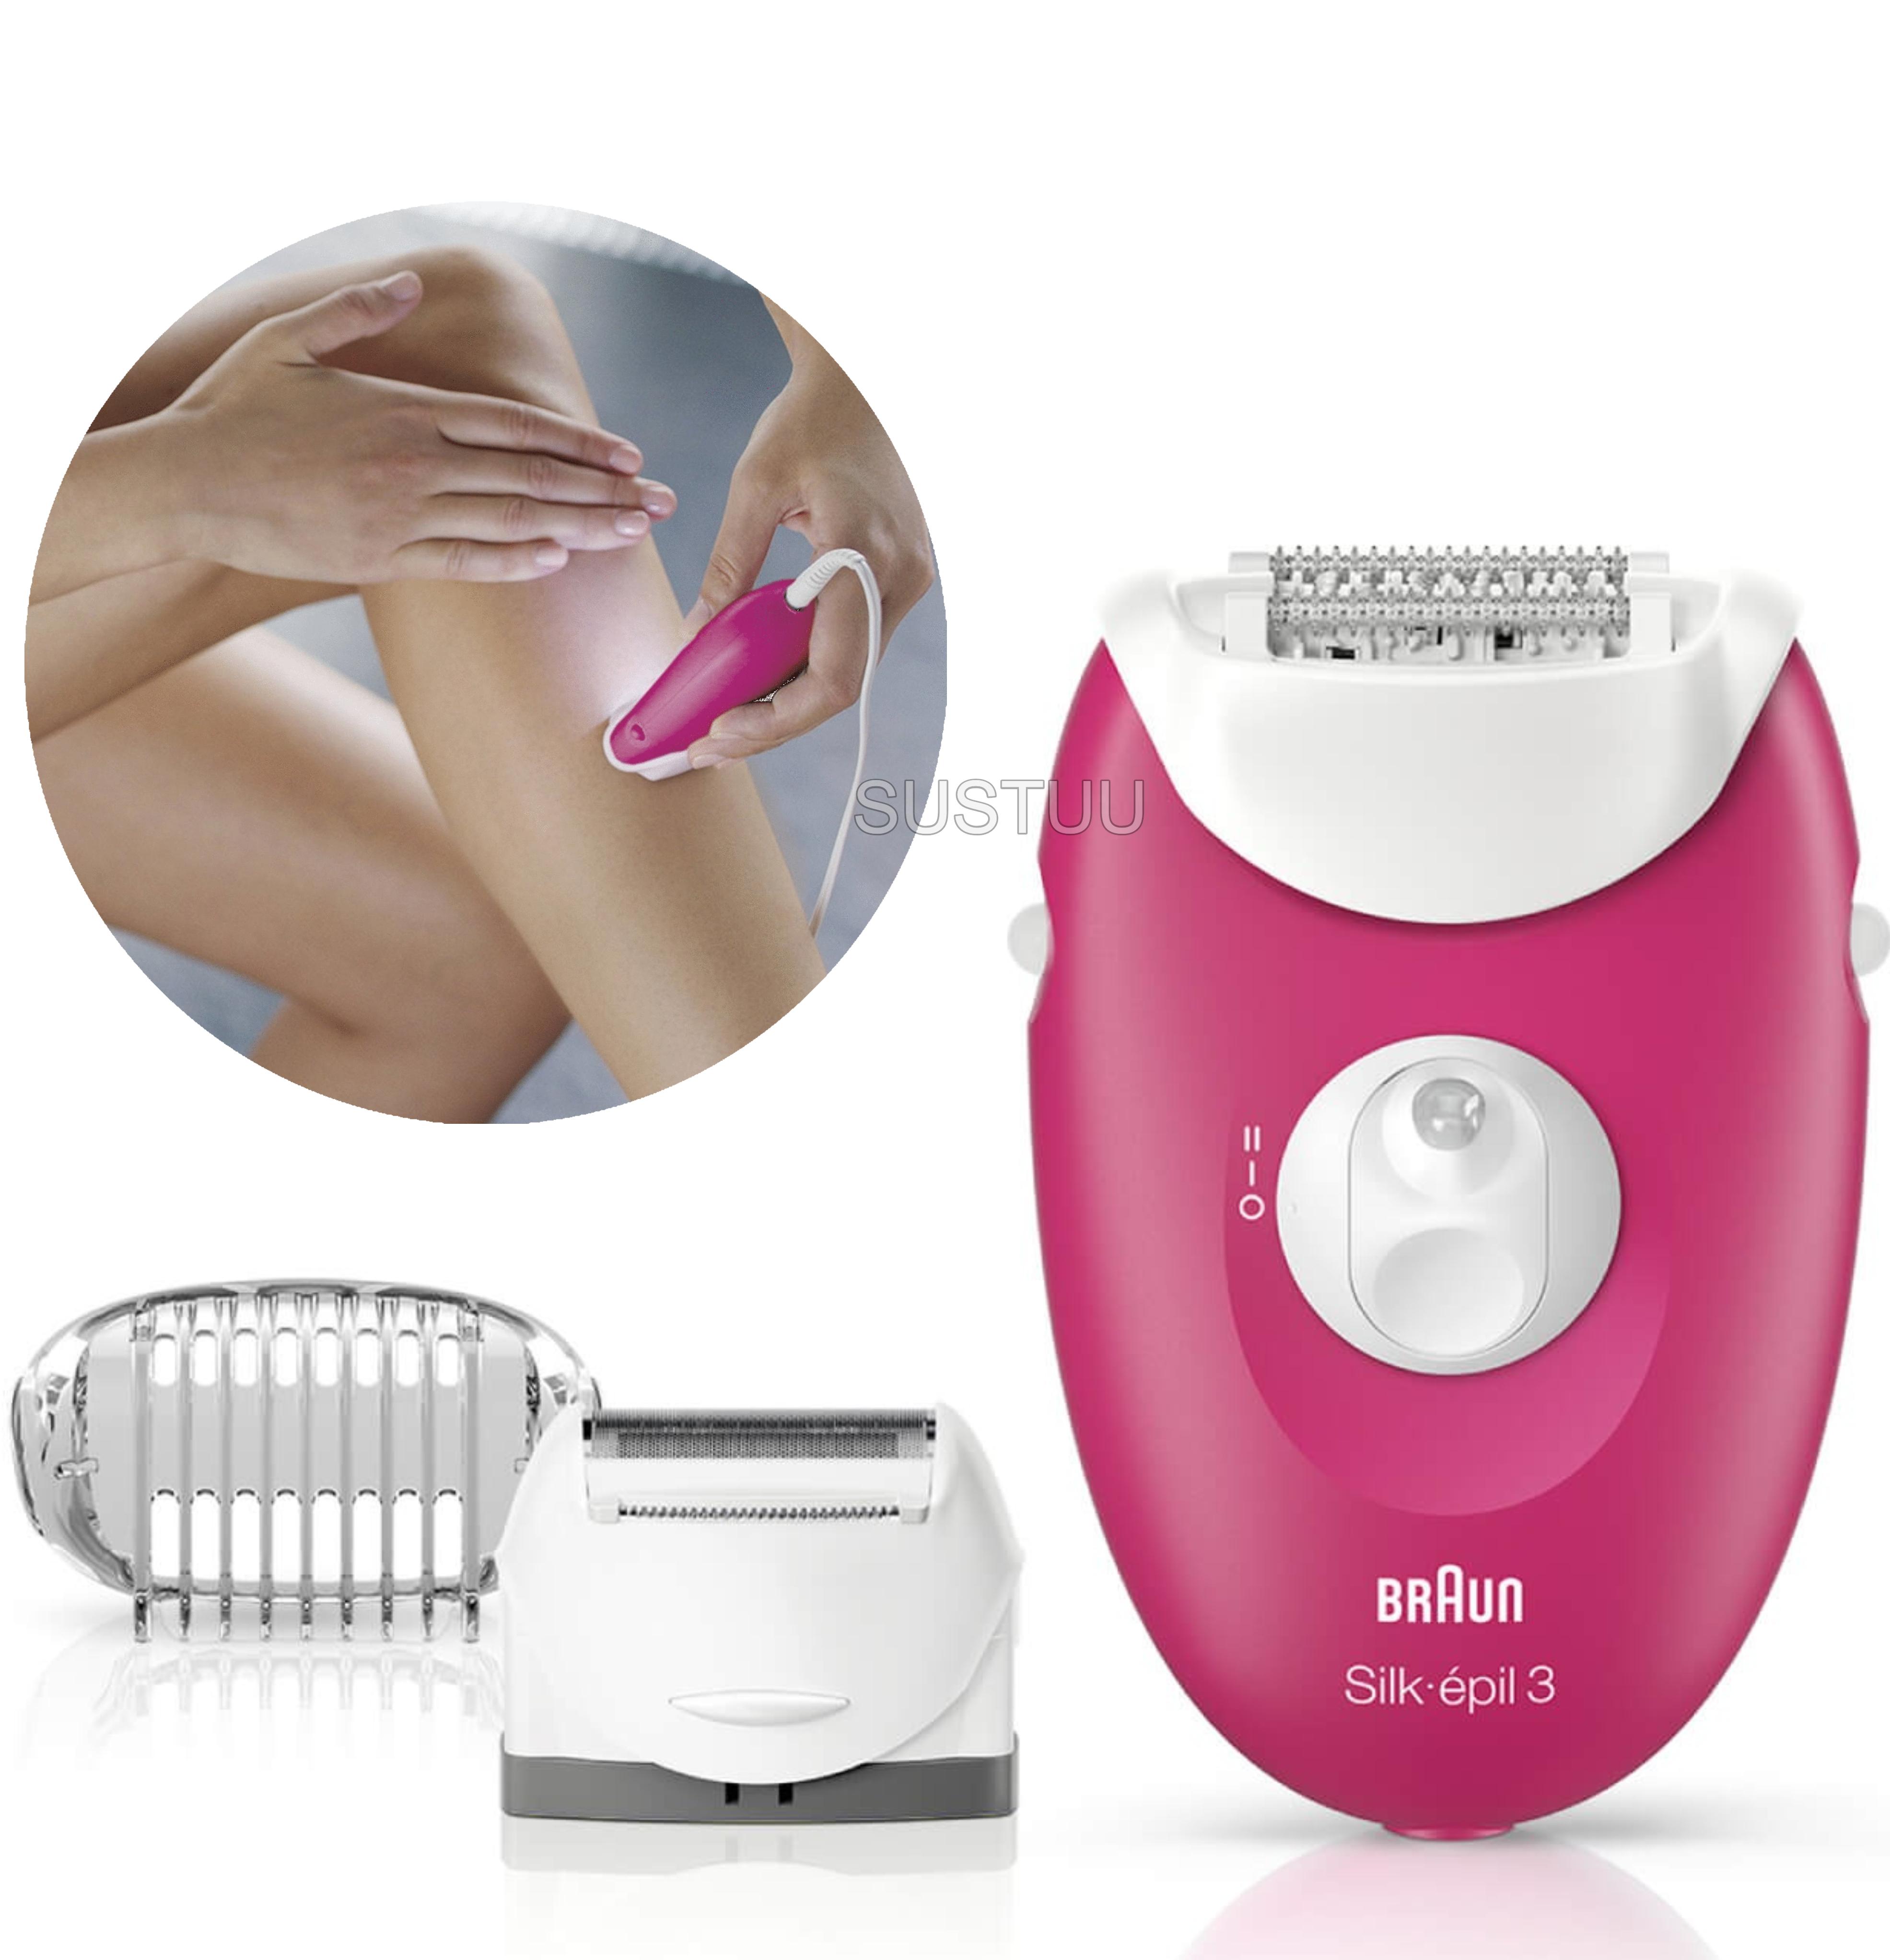 Braun Silk-Epil 3 Corded Epilator + 3 Extras | Women's Hair Removal | Raspberry Pink